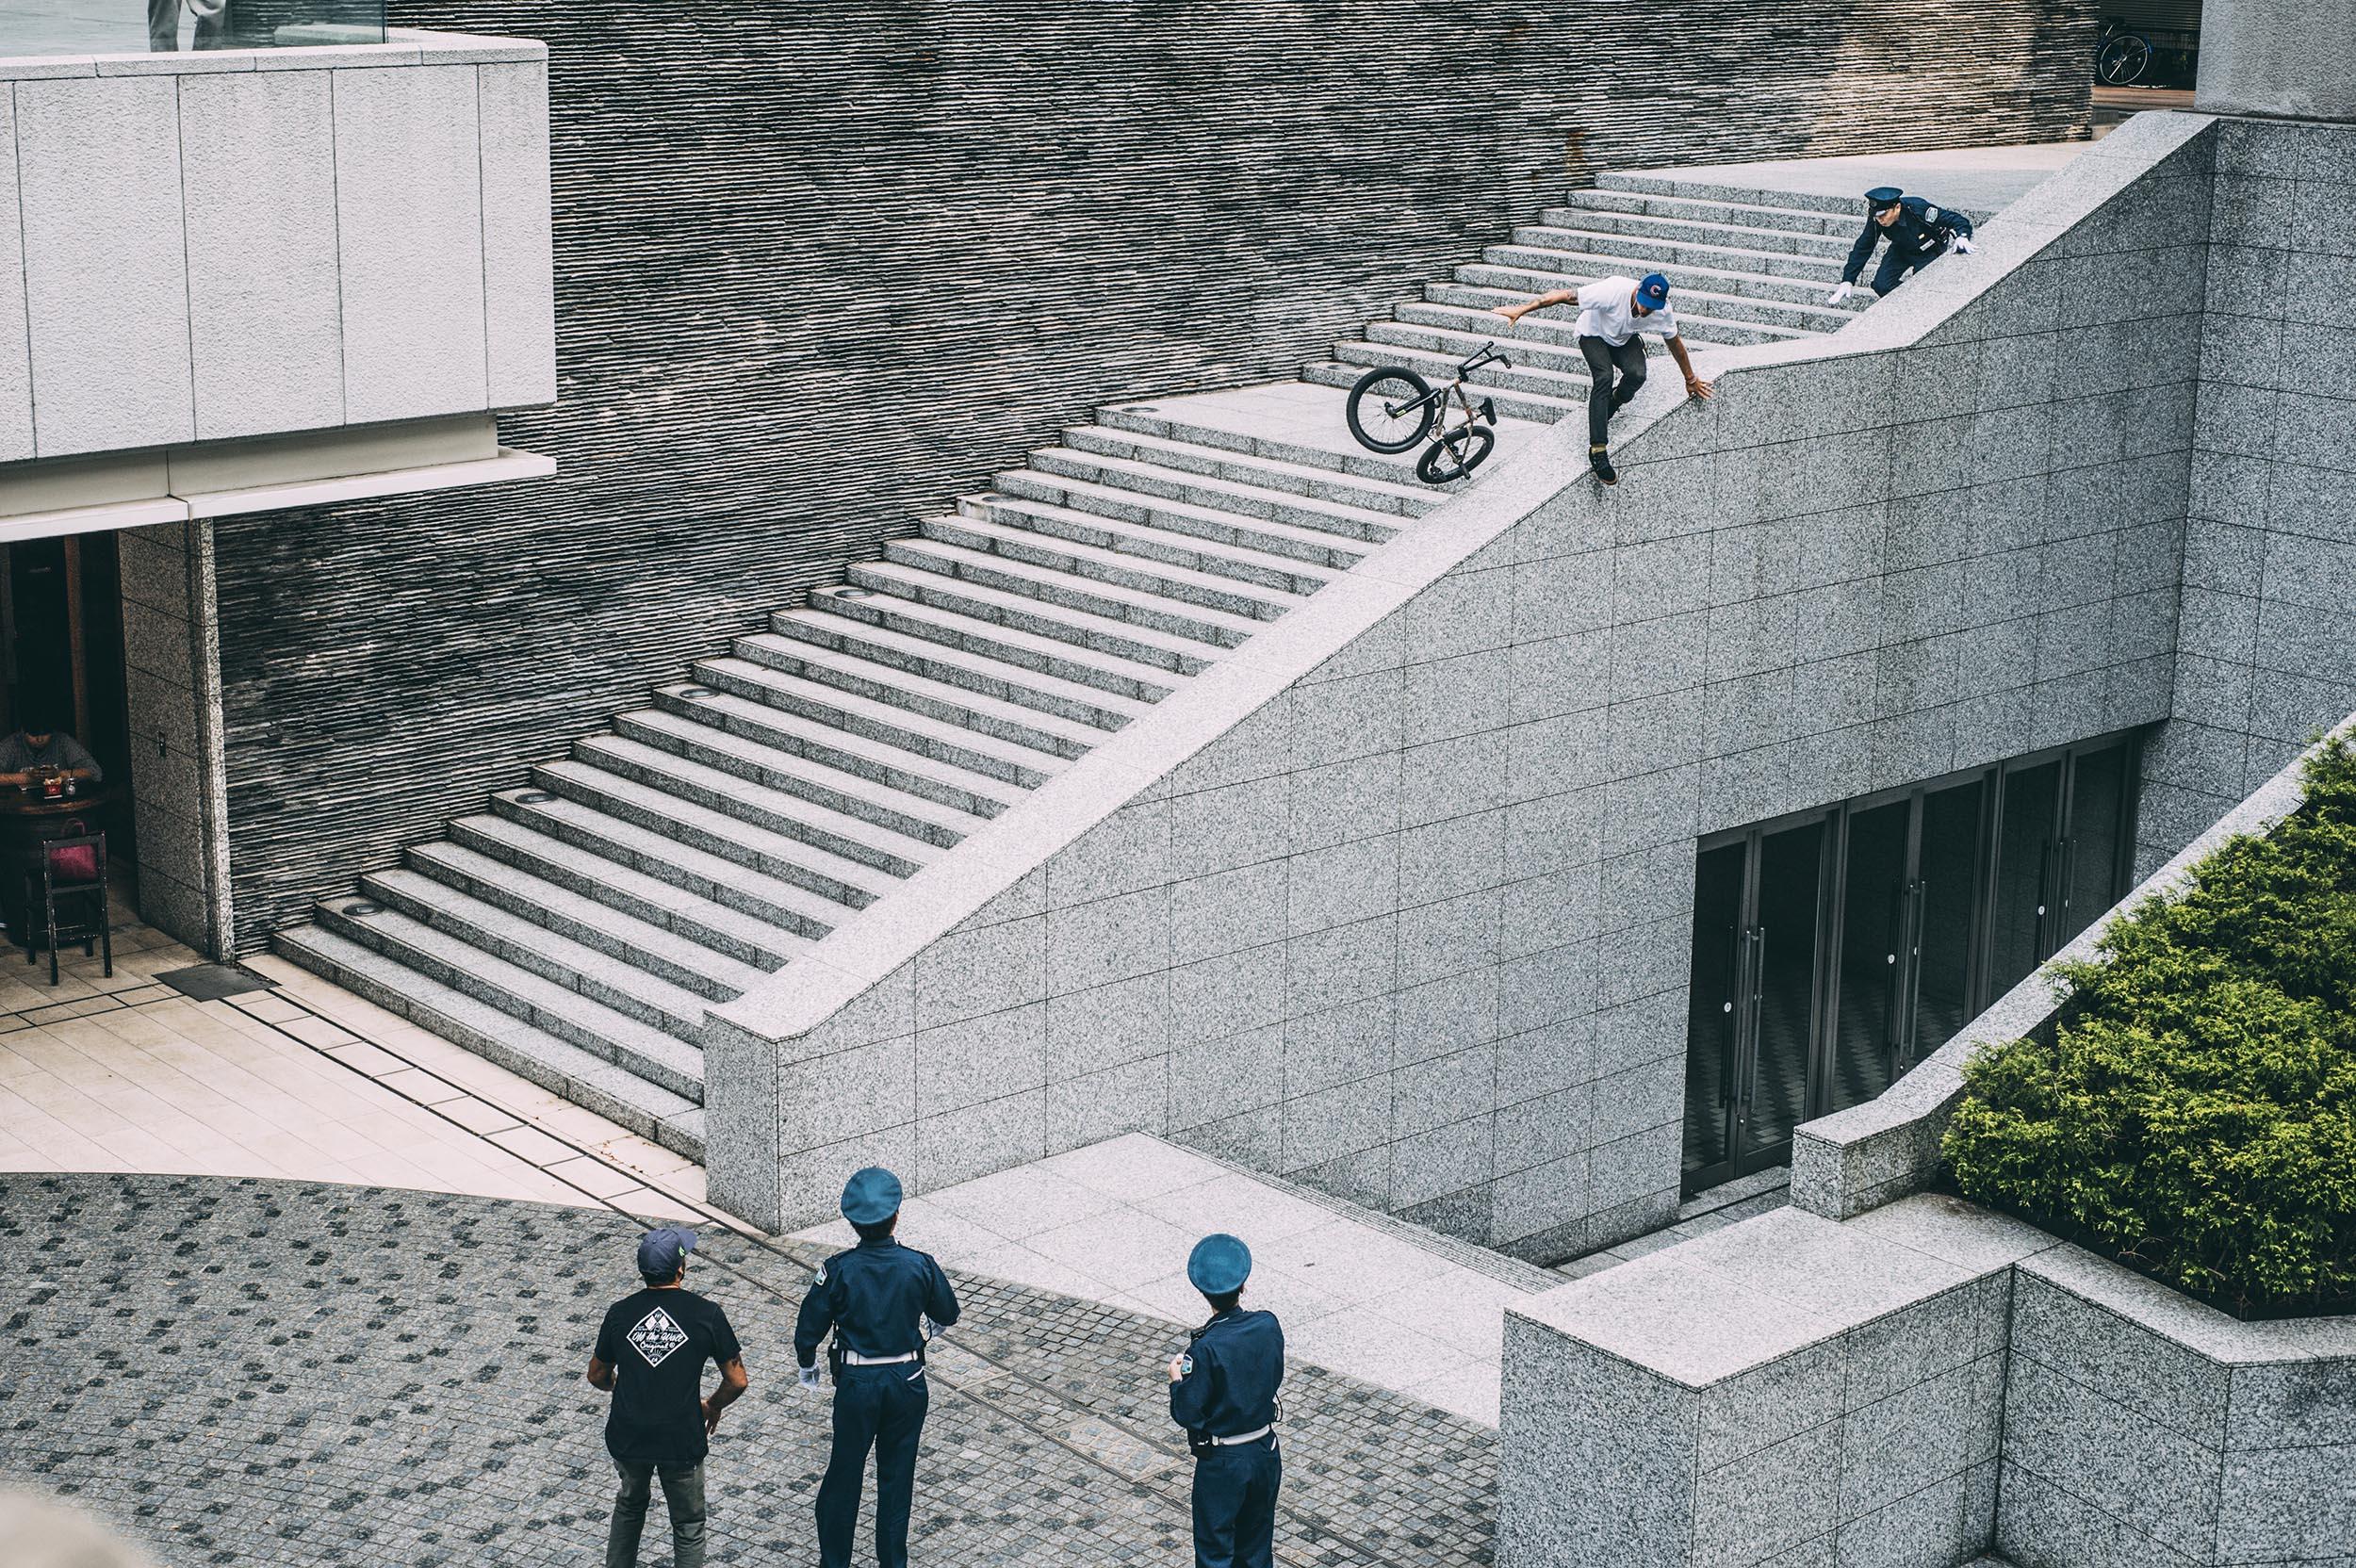 Nathan Williams for Monster Energy - Tokyo, Japan